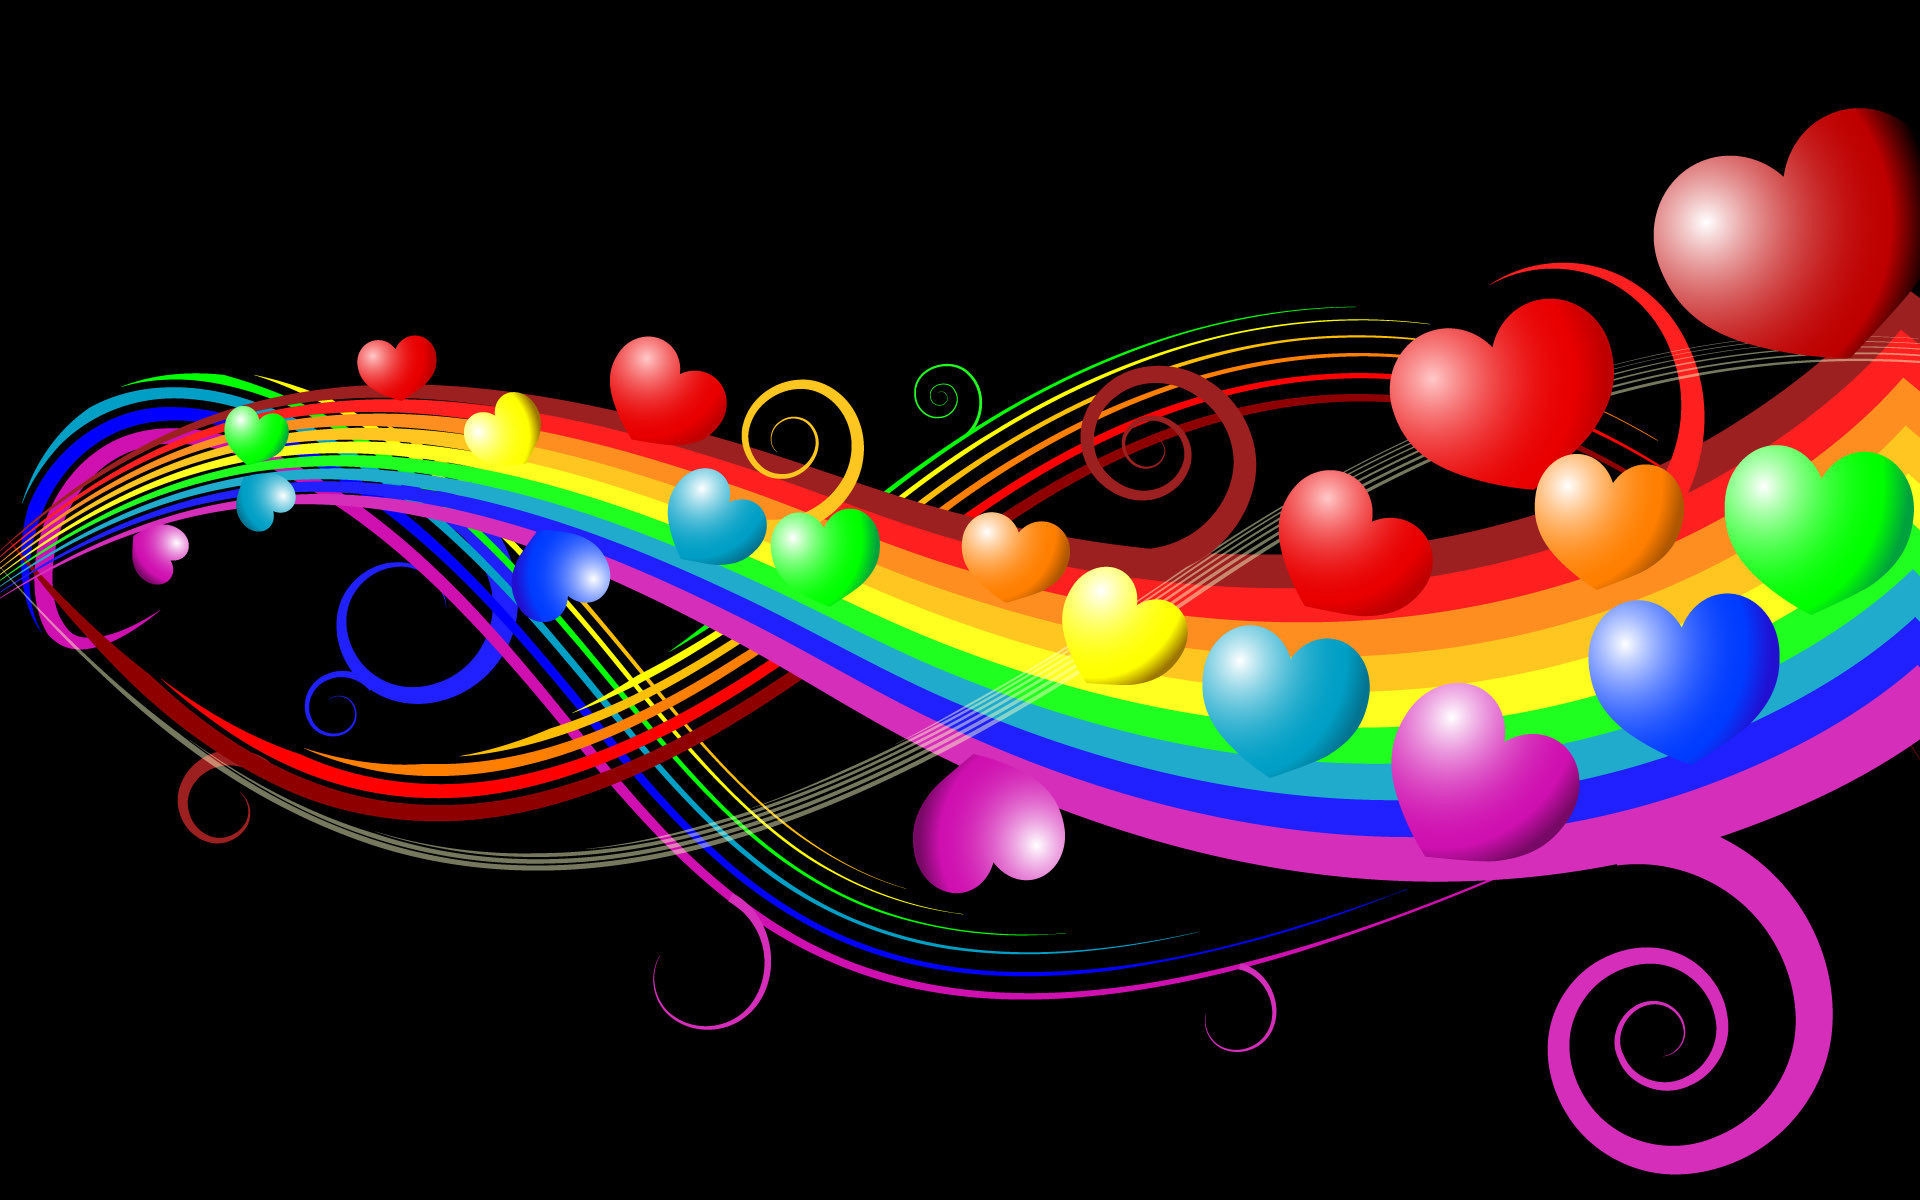 1920x1200 Wallpaper Heart Rainbow